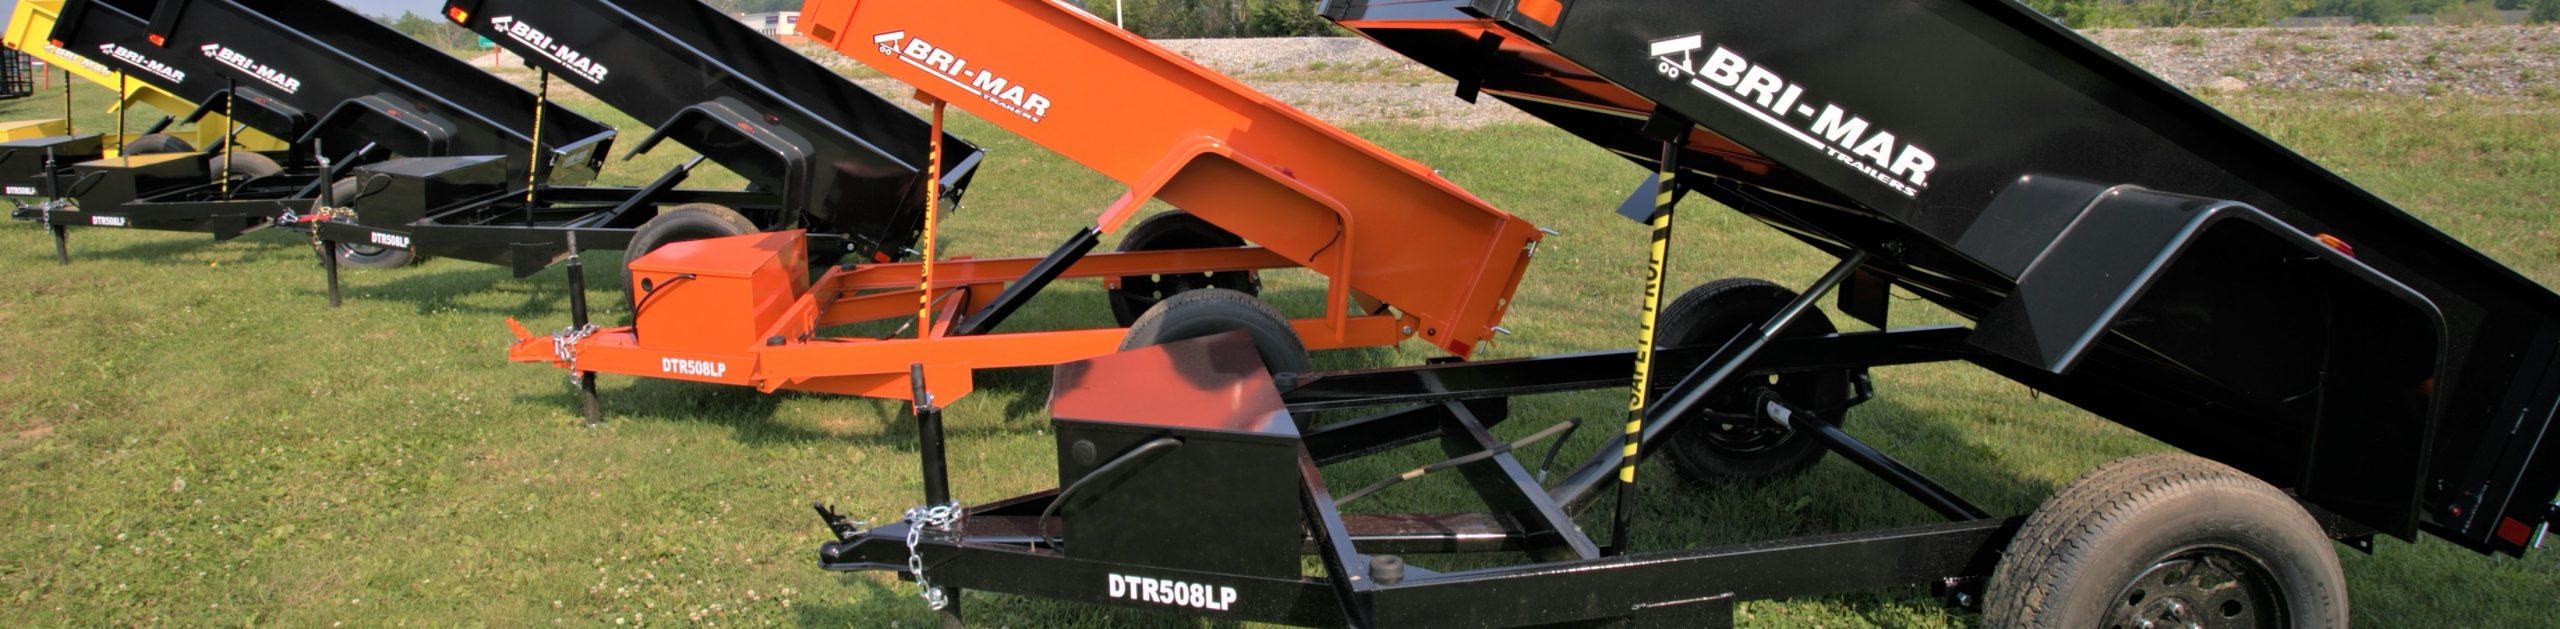 Dump trailer with hydraulics